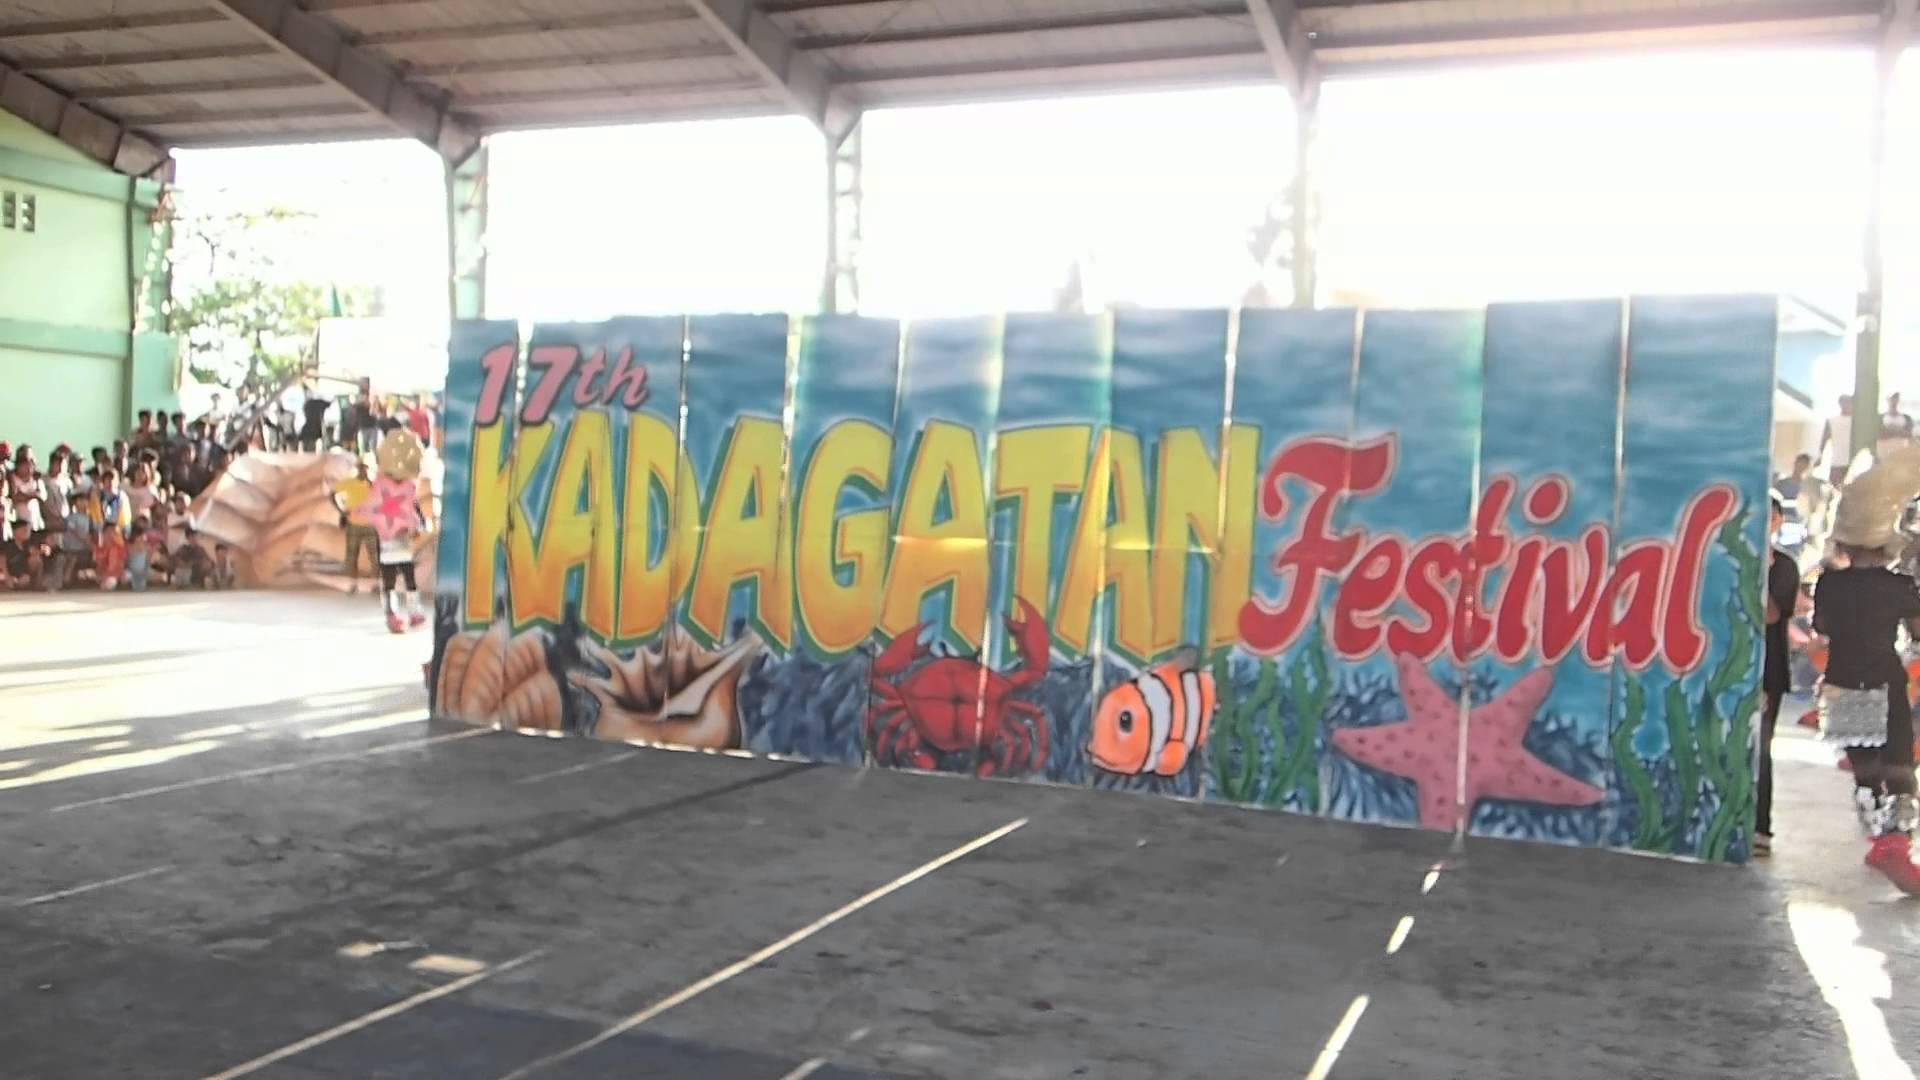 Mercedes Kadagatan Festival